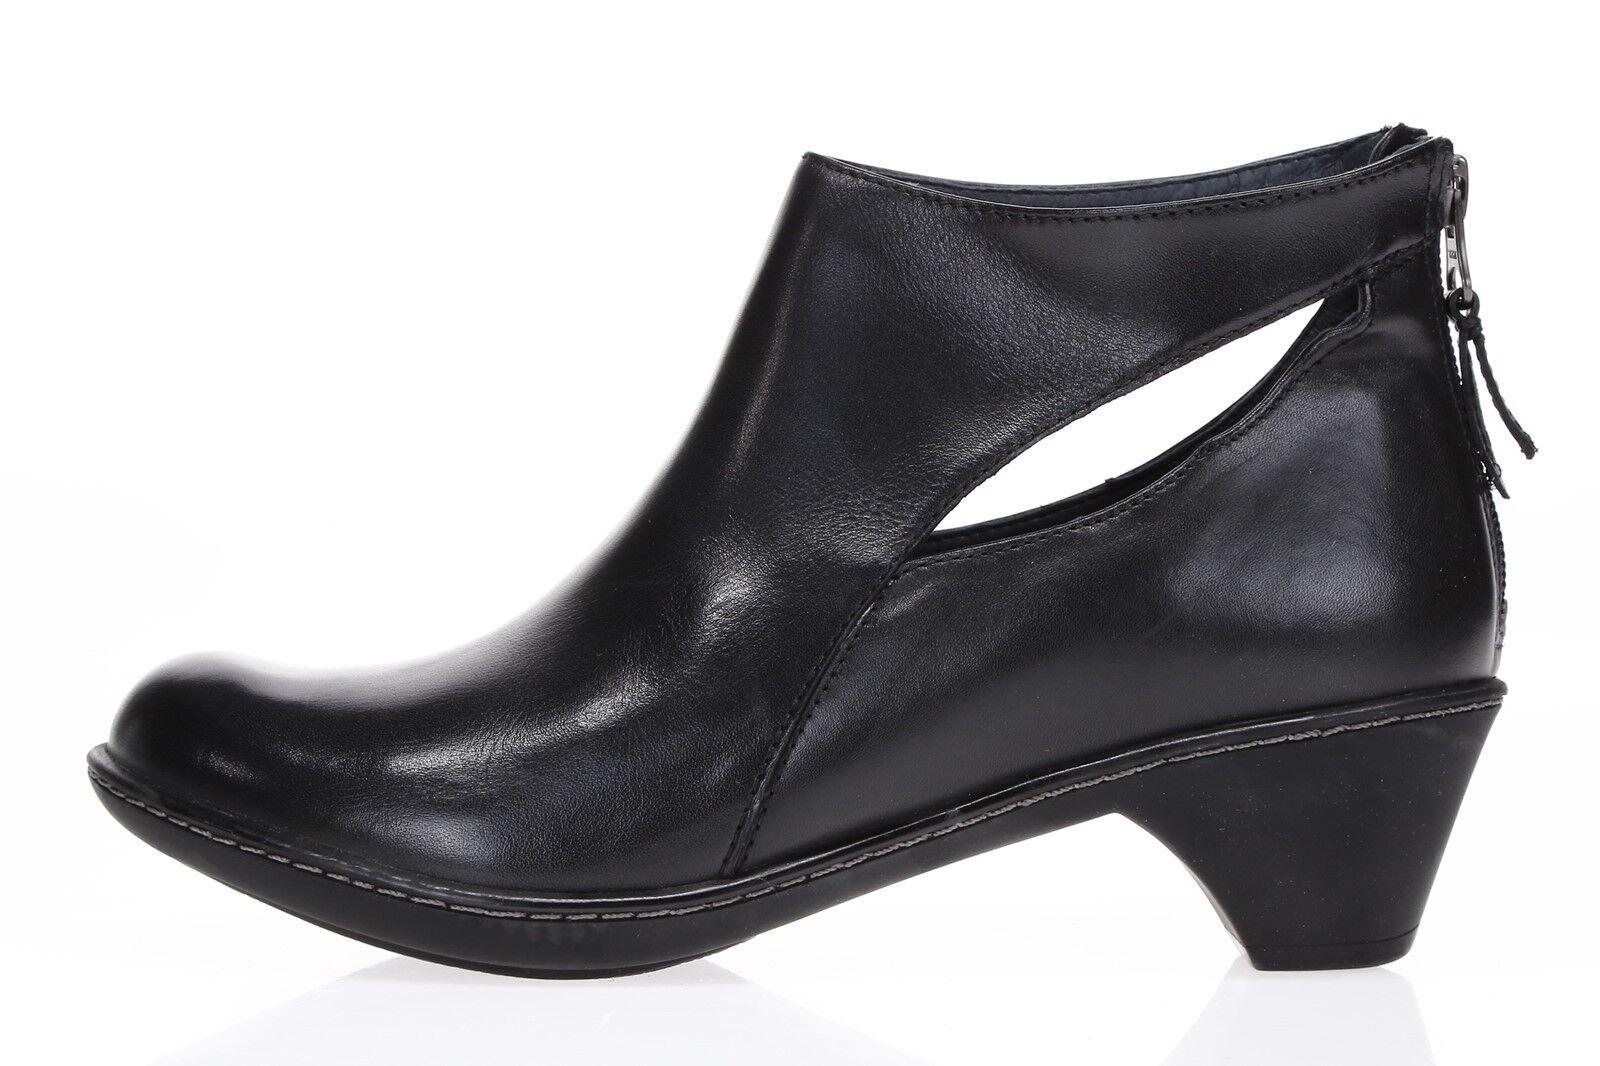 ordinare on-line DANSKO 234522 donna 'Bonita' Burnished Nappa Leather Ankle avvioies avvioies avvioies Sz 40  prezzo ragionevole